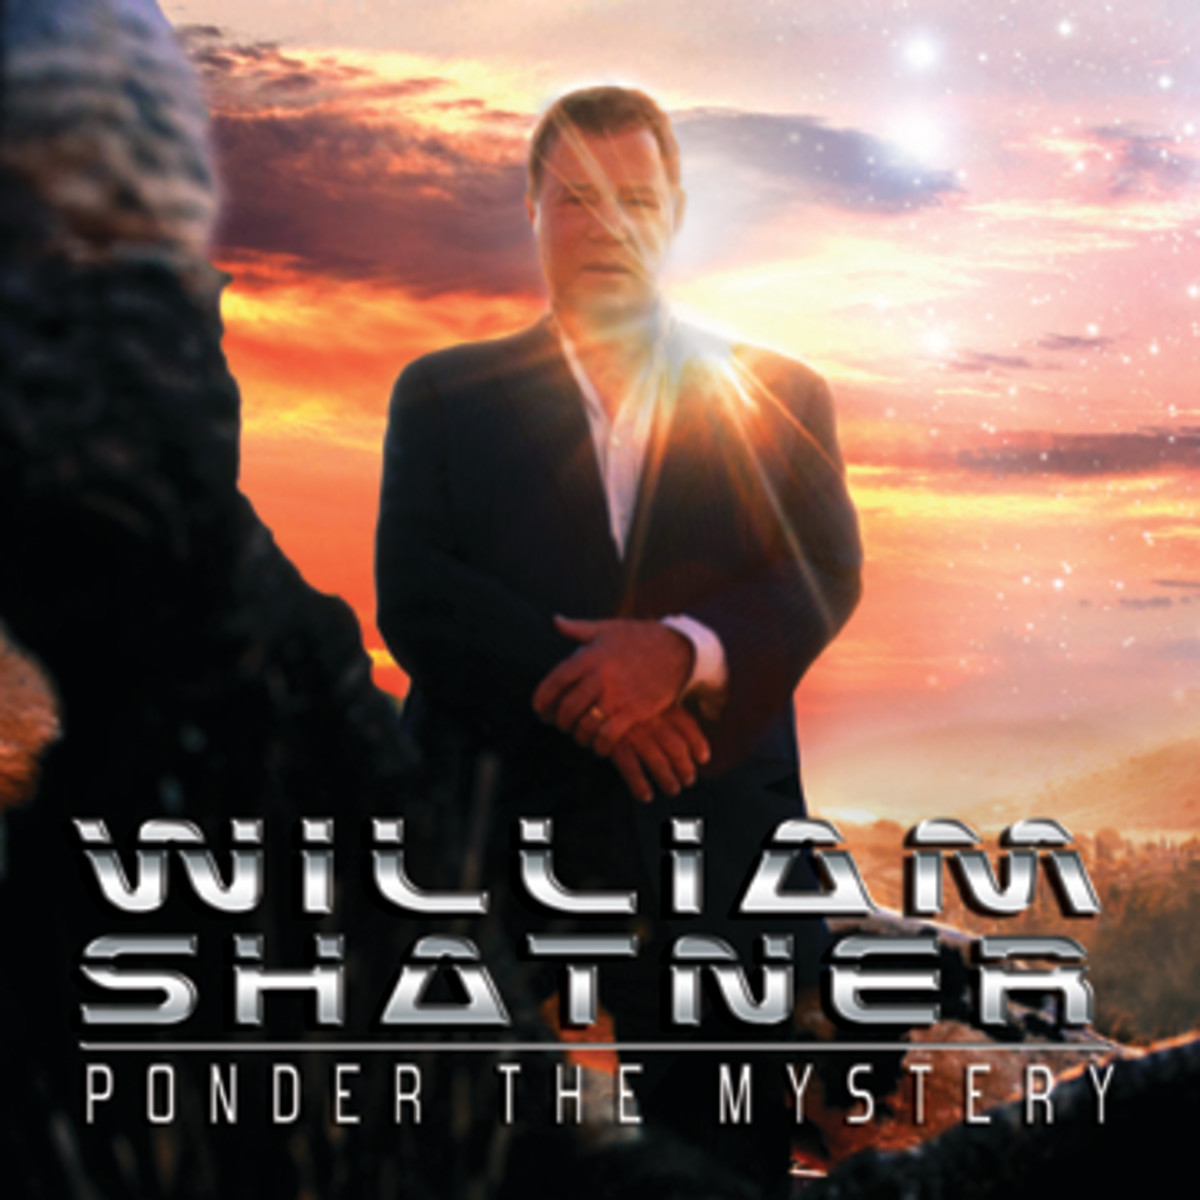 William Shatner Ponder The Mystery album